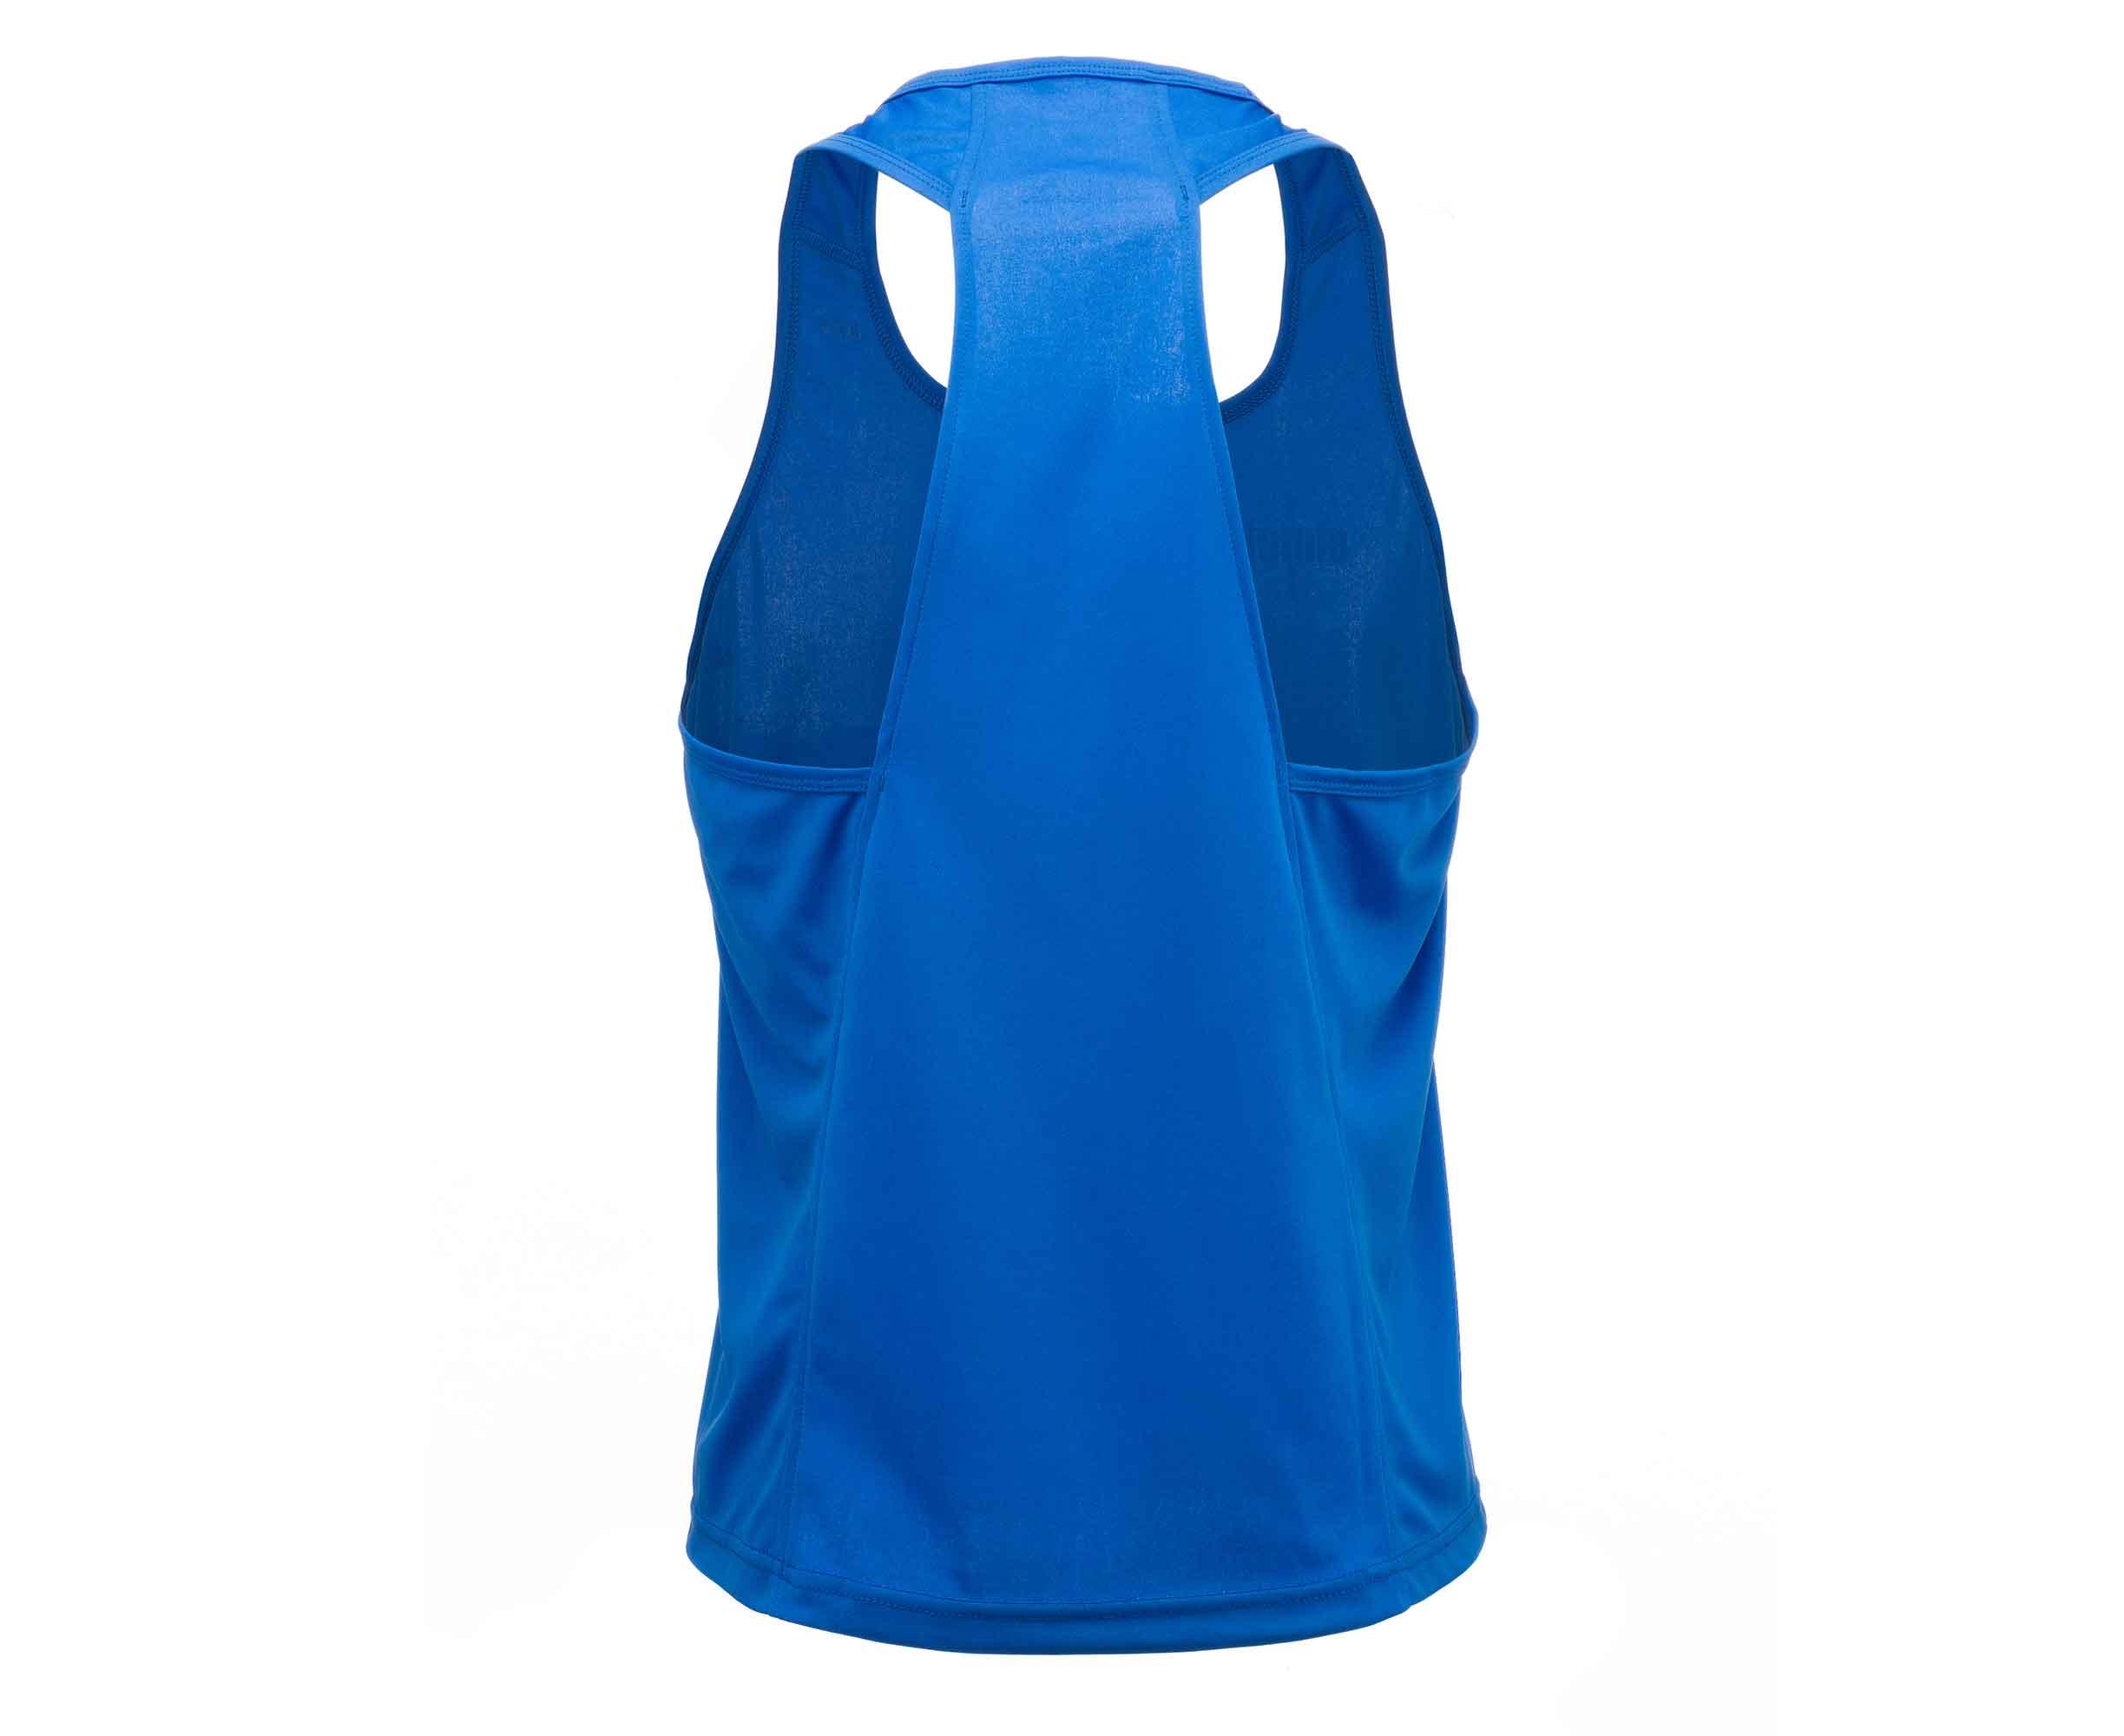 Майка боксерская Adidas Clinch Olimp синяя XL